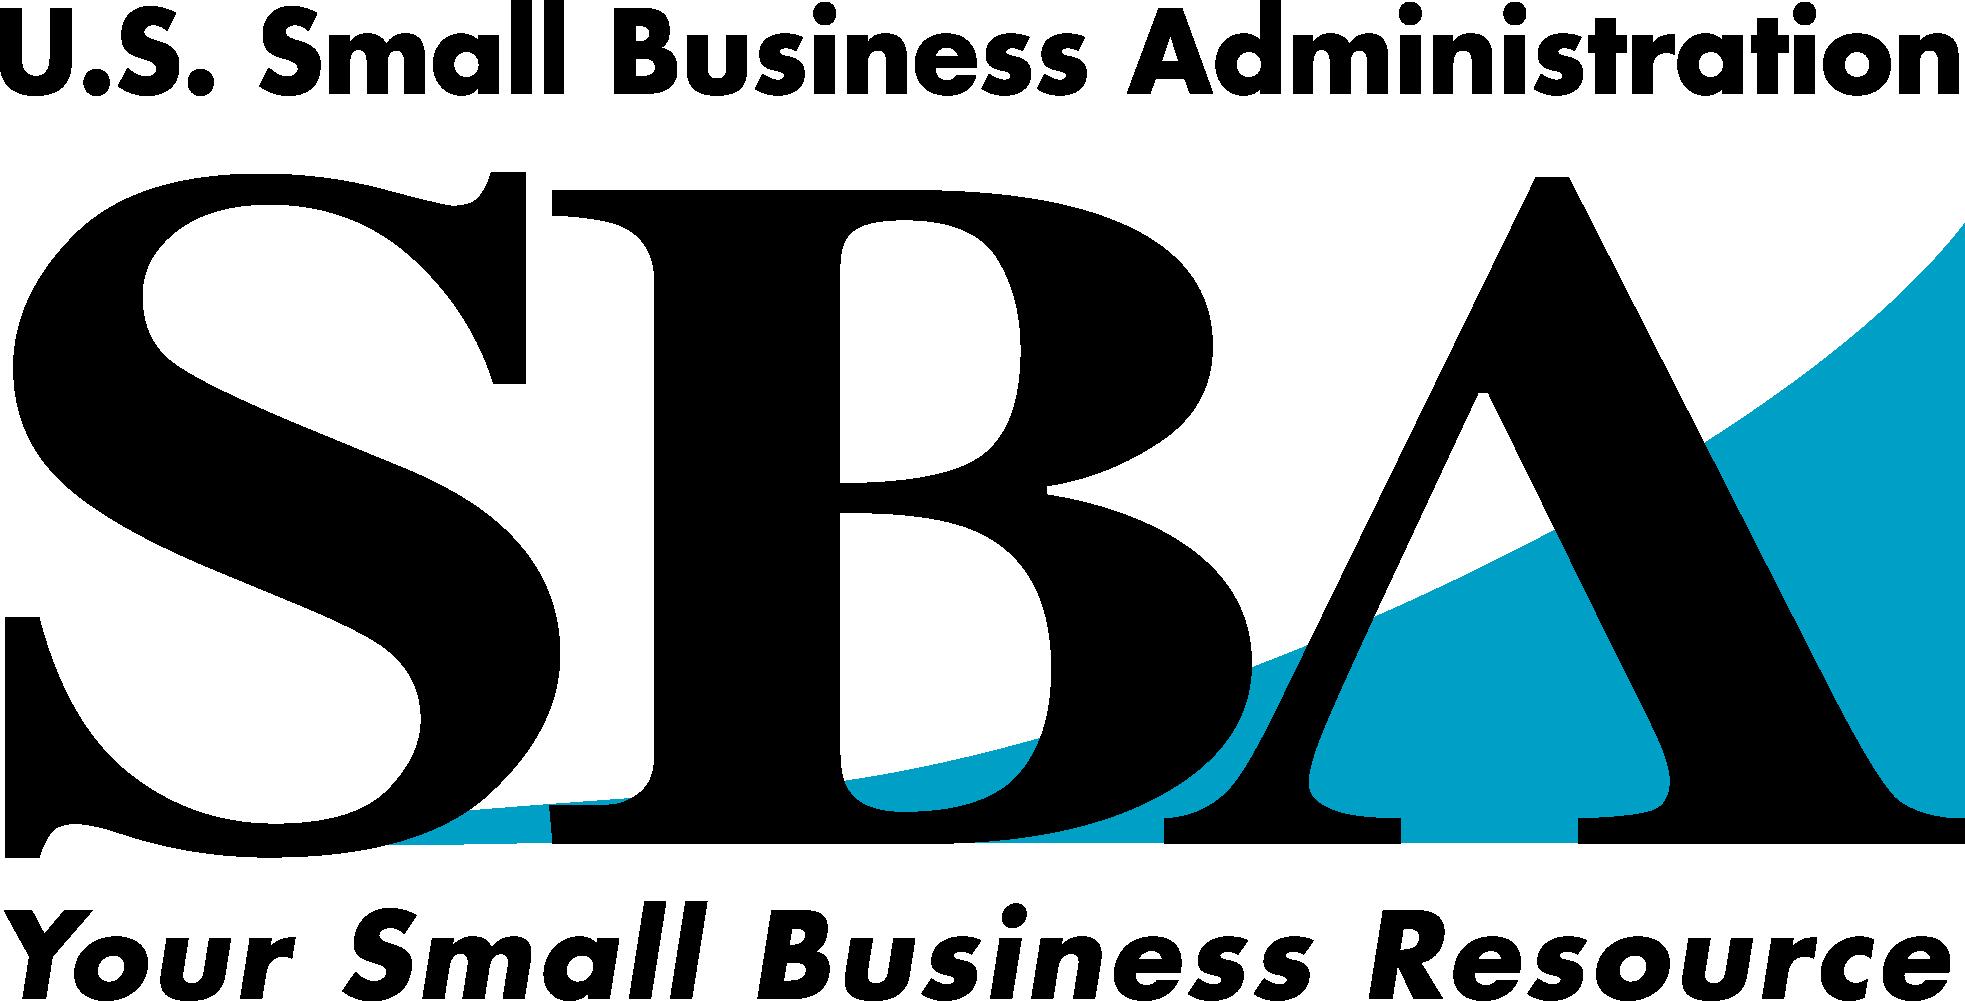 Small business resource(SBA)